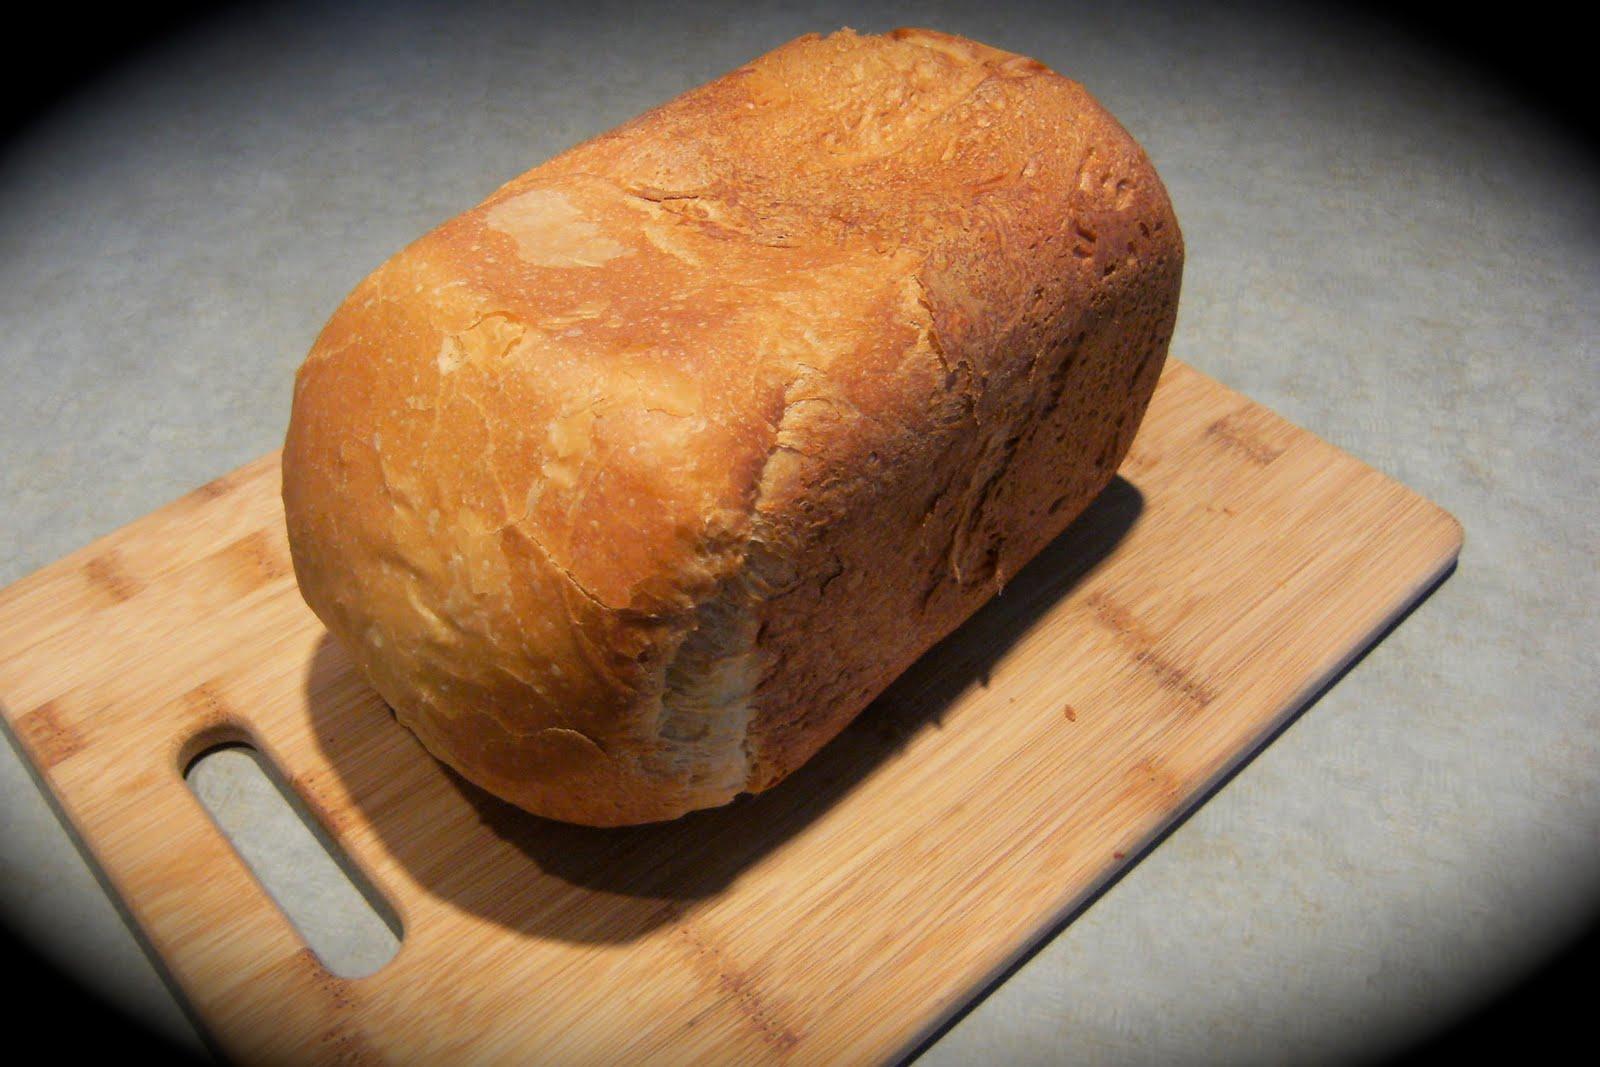 My Retro Kitchen: Millie's Whole Wheat Challah